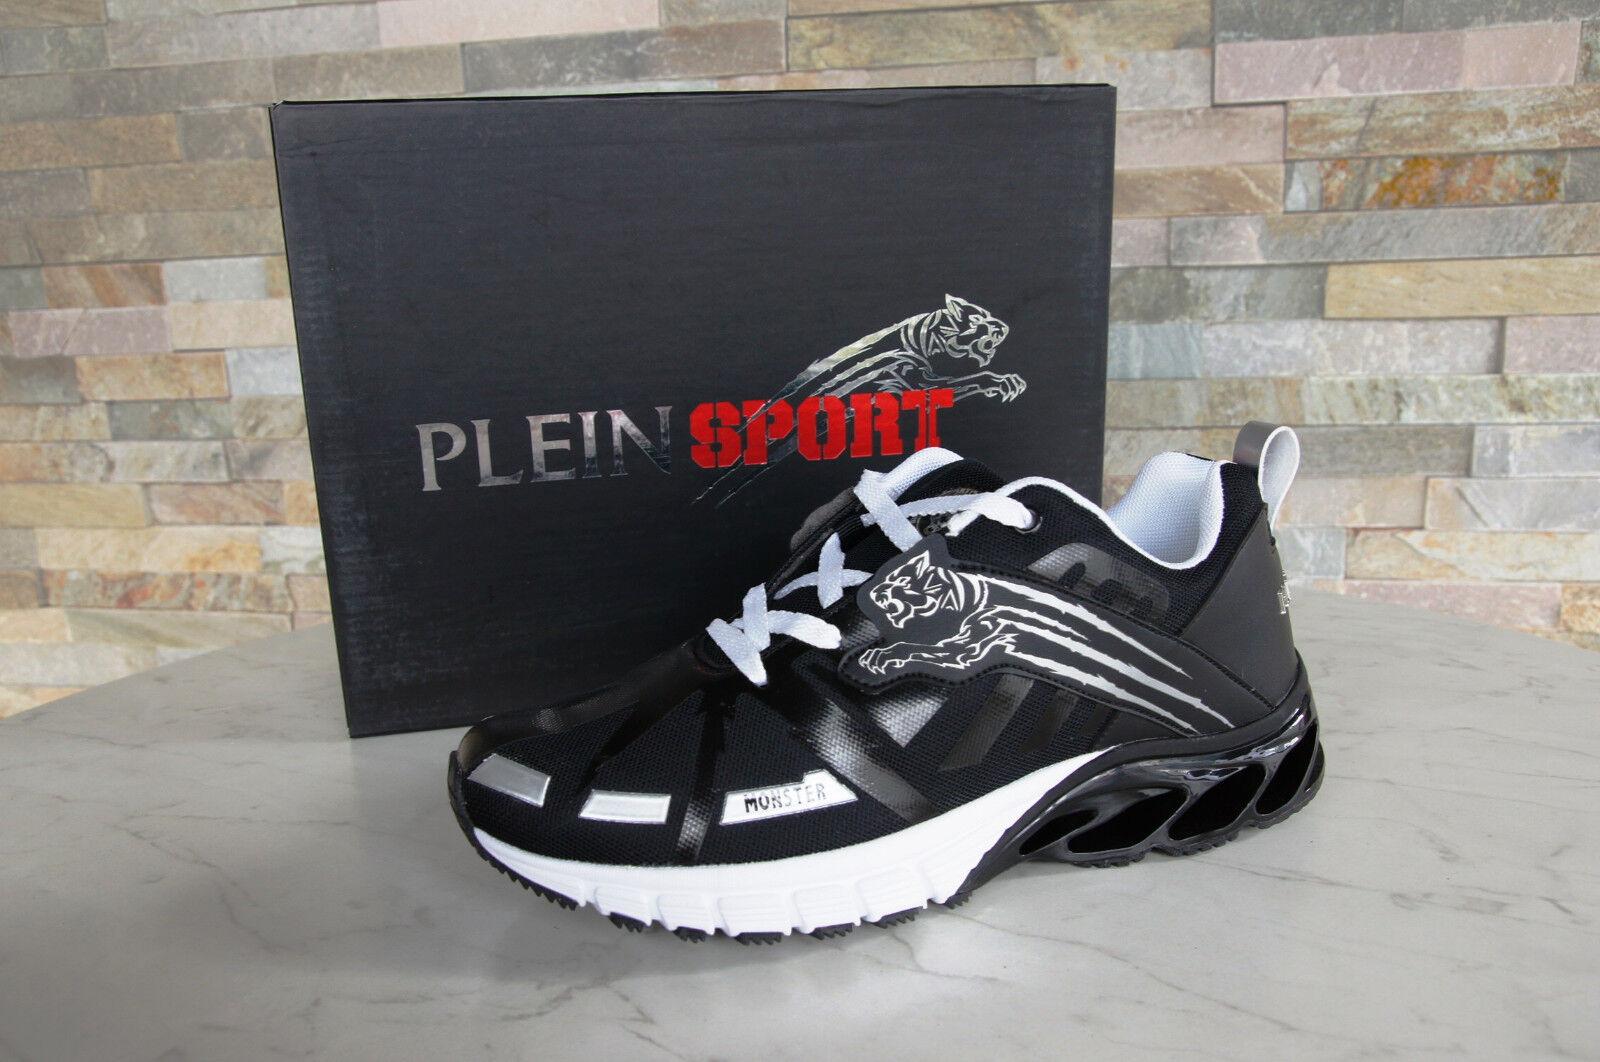 PLEIN SPORT EU 41  US 8 UK 7.5 Turnschuhe Schuhe RUNNER schwarz neu ehem